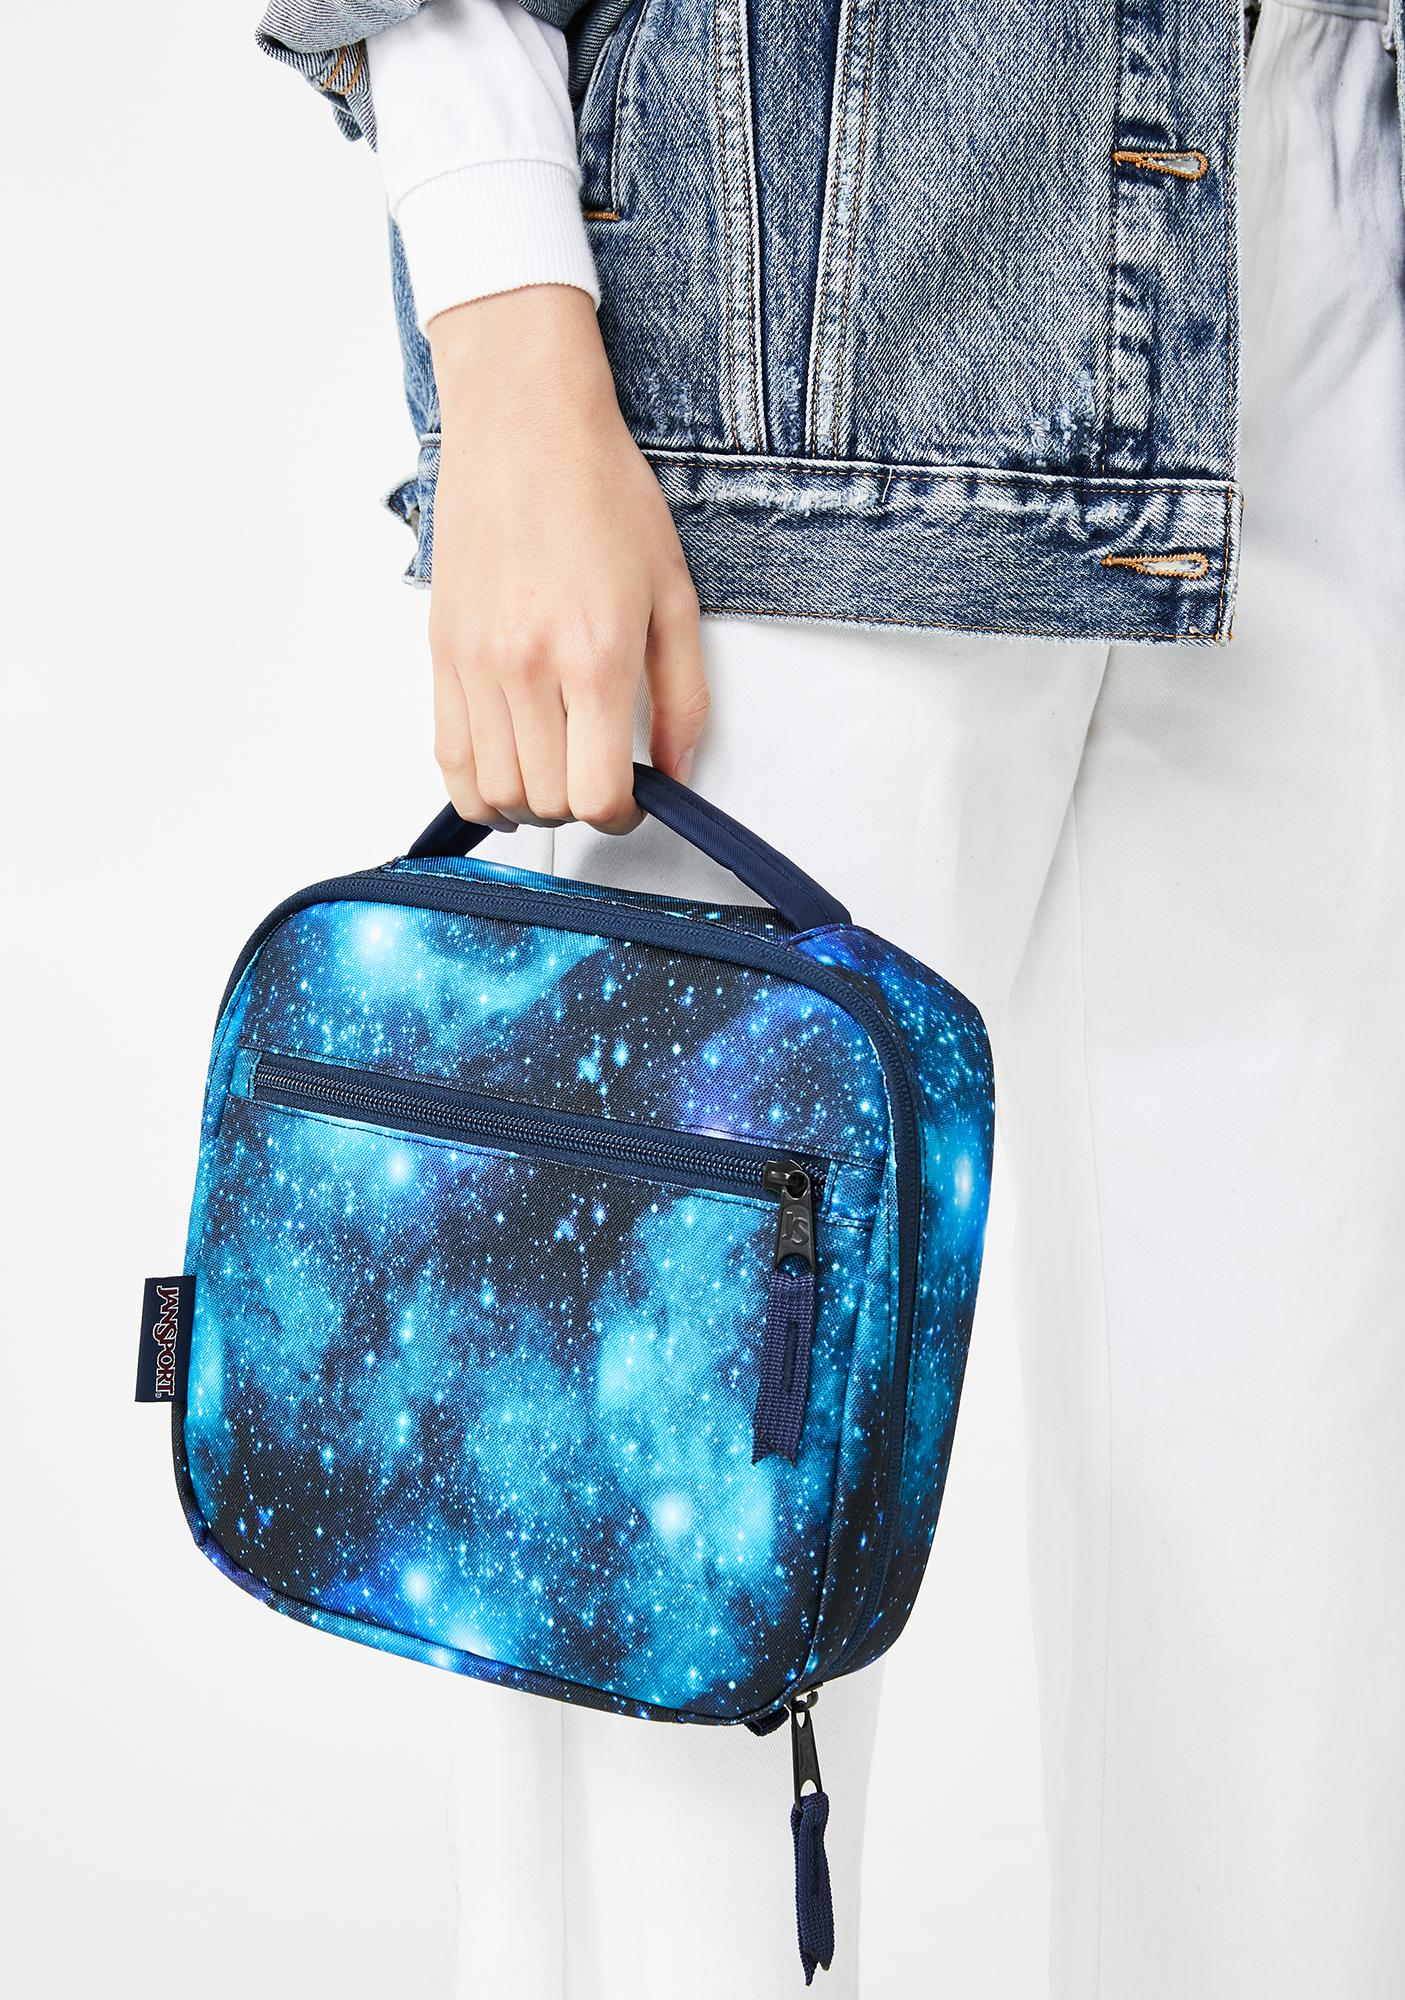 55e0cfdada8b Galaxy Lunch Break Insulated Bag